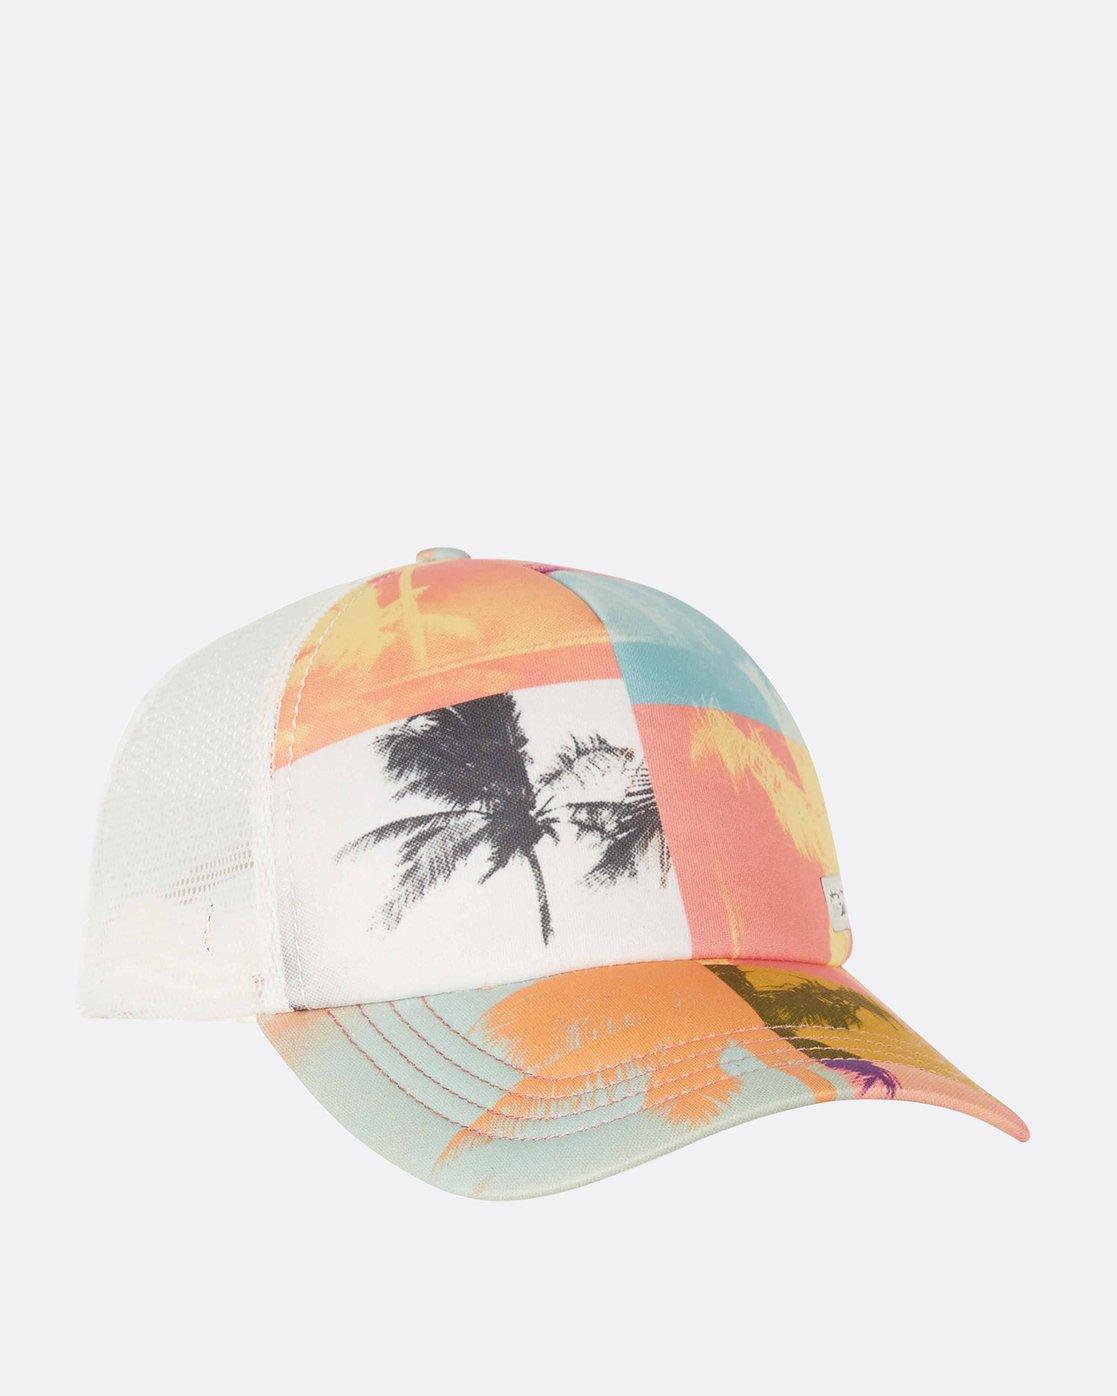 dbe57a0a2a91c1 6 Warholsurf Warhol Trucker Hat JAHTLWAR Billabong